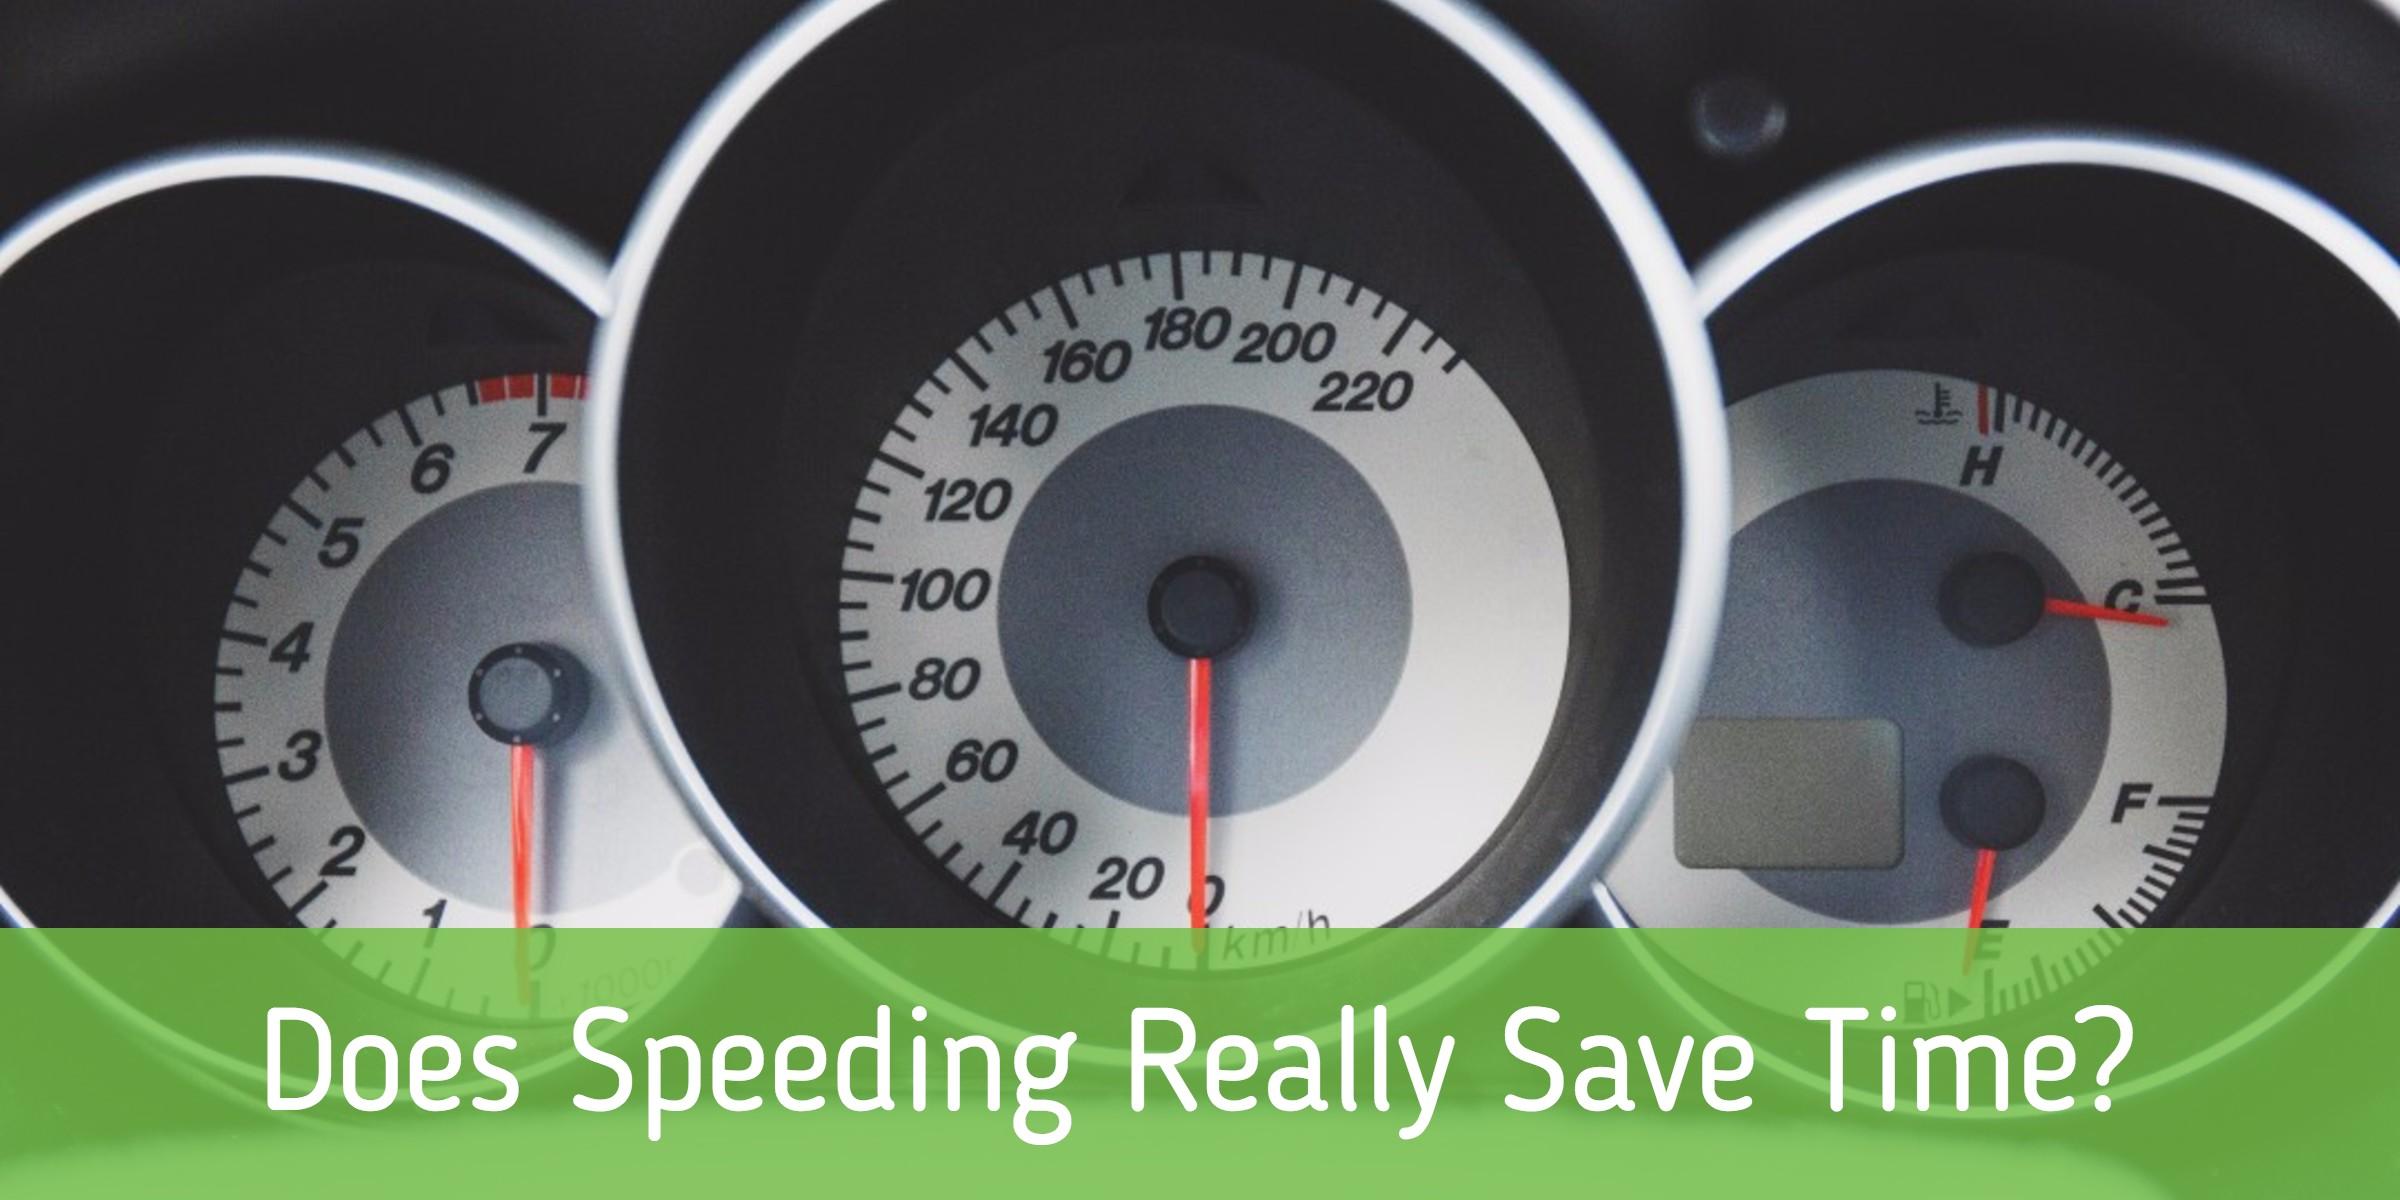 Does_Speeding_Really_Save_Time-.jpg